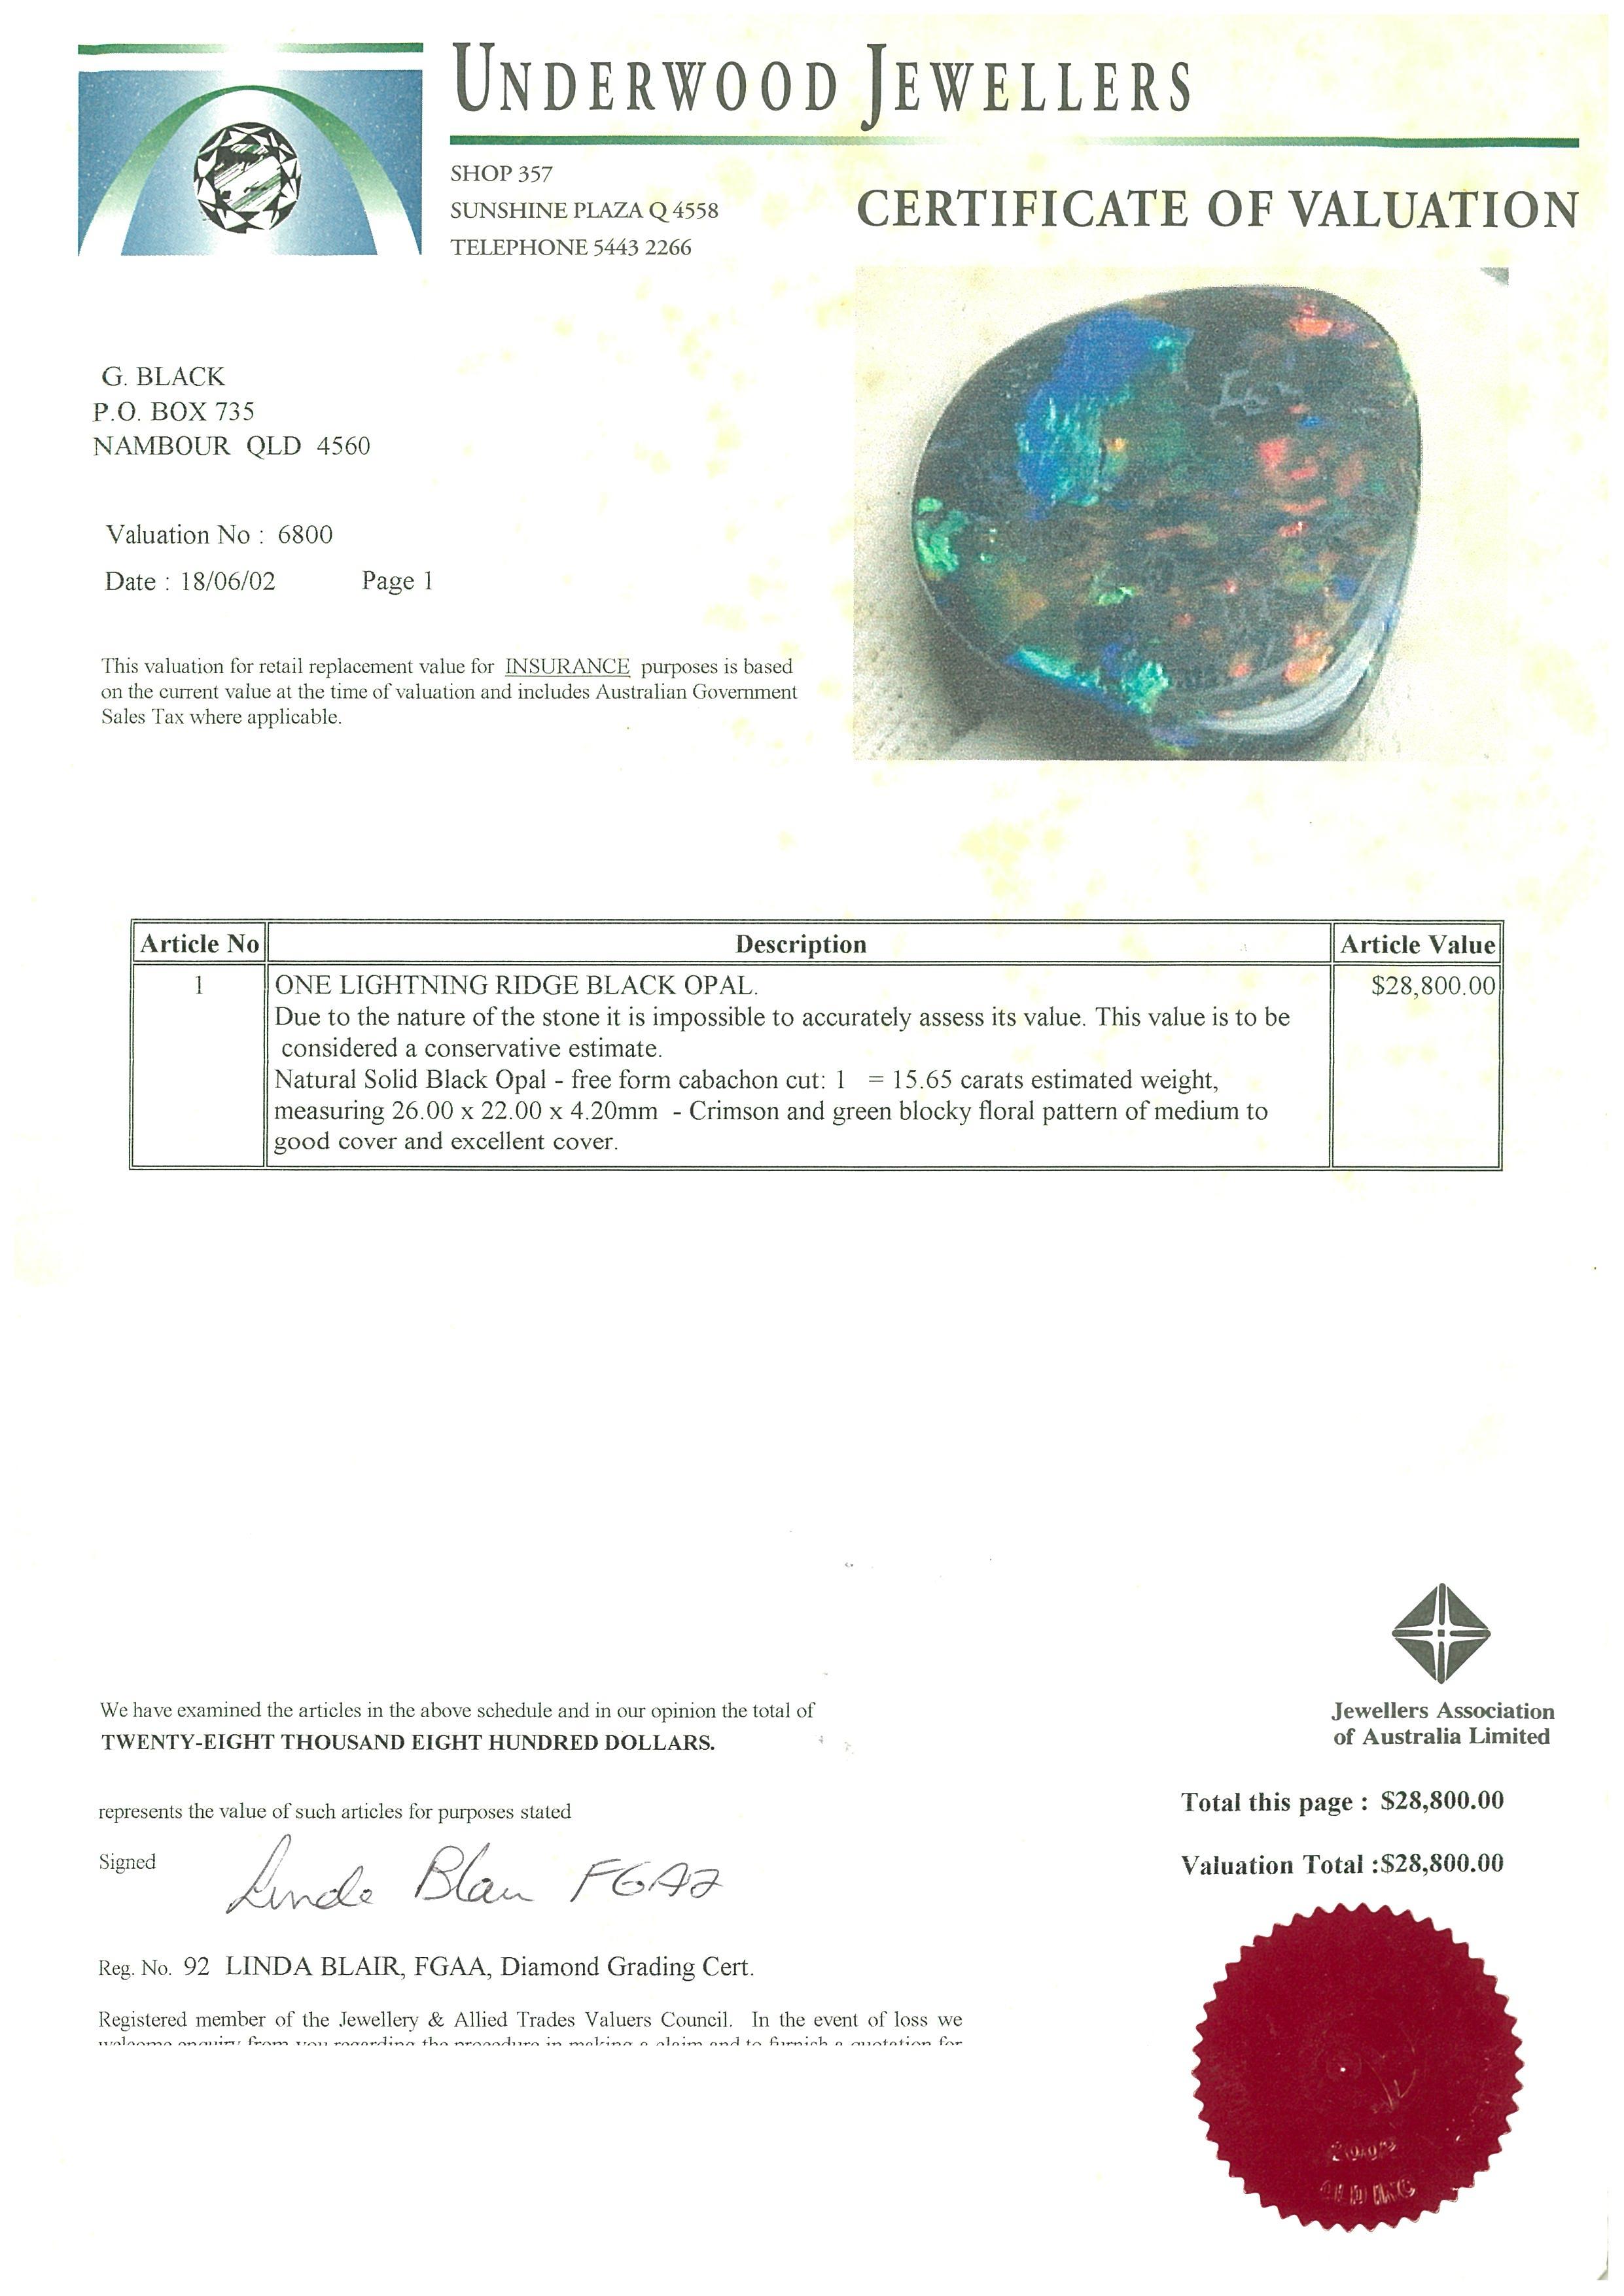 handmade opal jewelry,handmade opal jewelry black,handmade opal jewellery,handmade opal rings